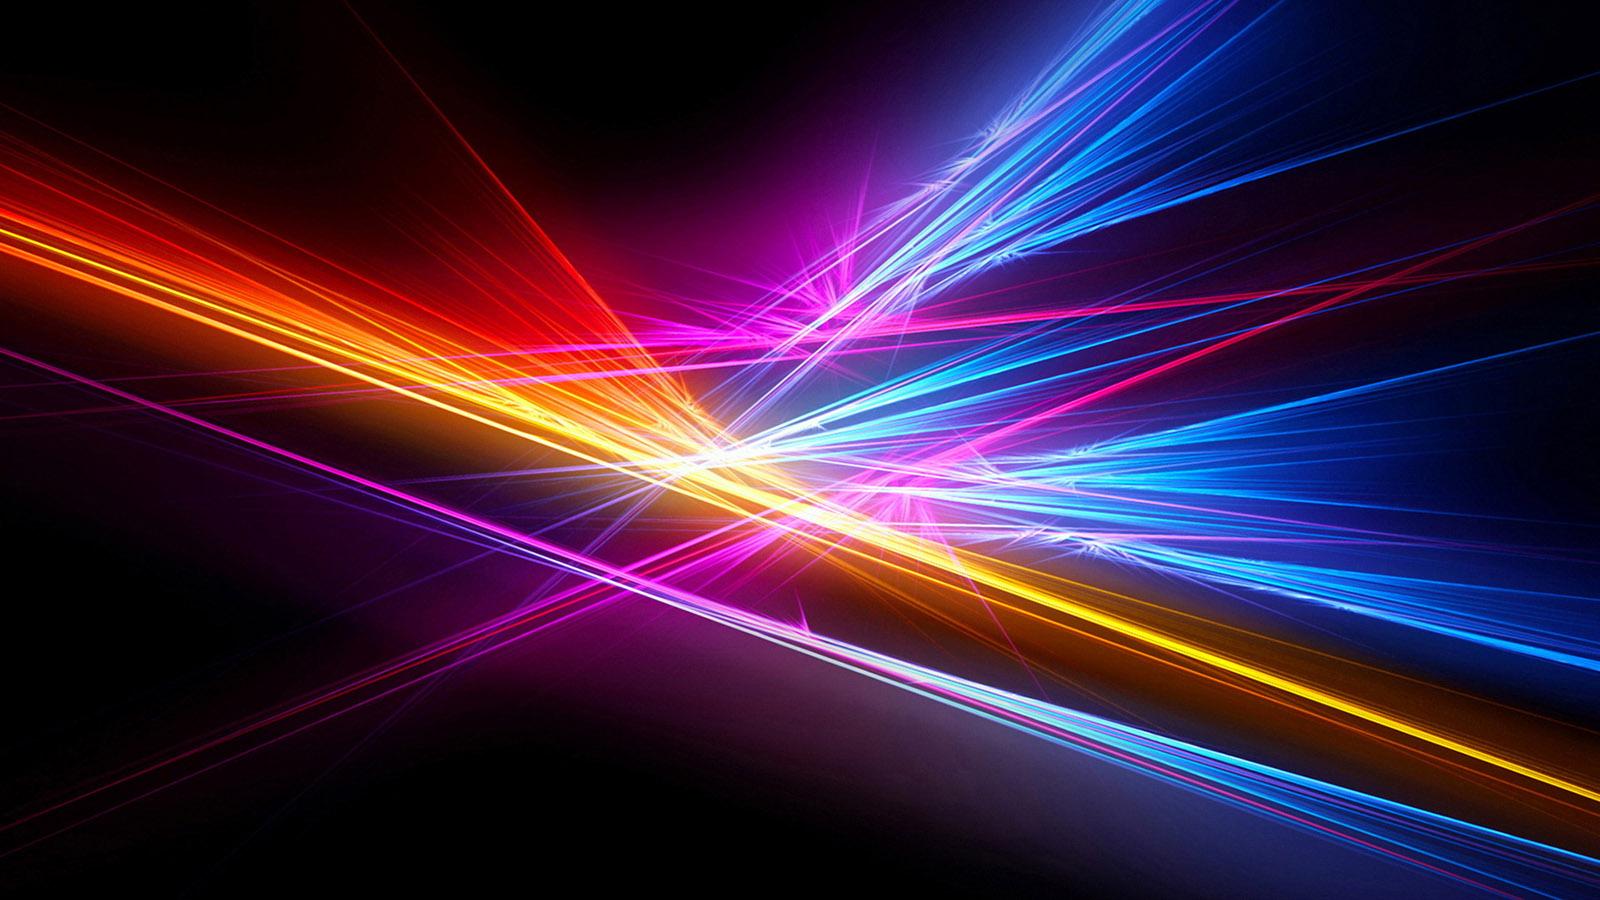 Light Effect Hd Wallpaper Background Images: Lighting Wallpapers For Desktops